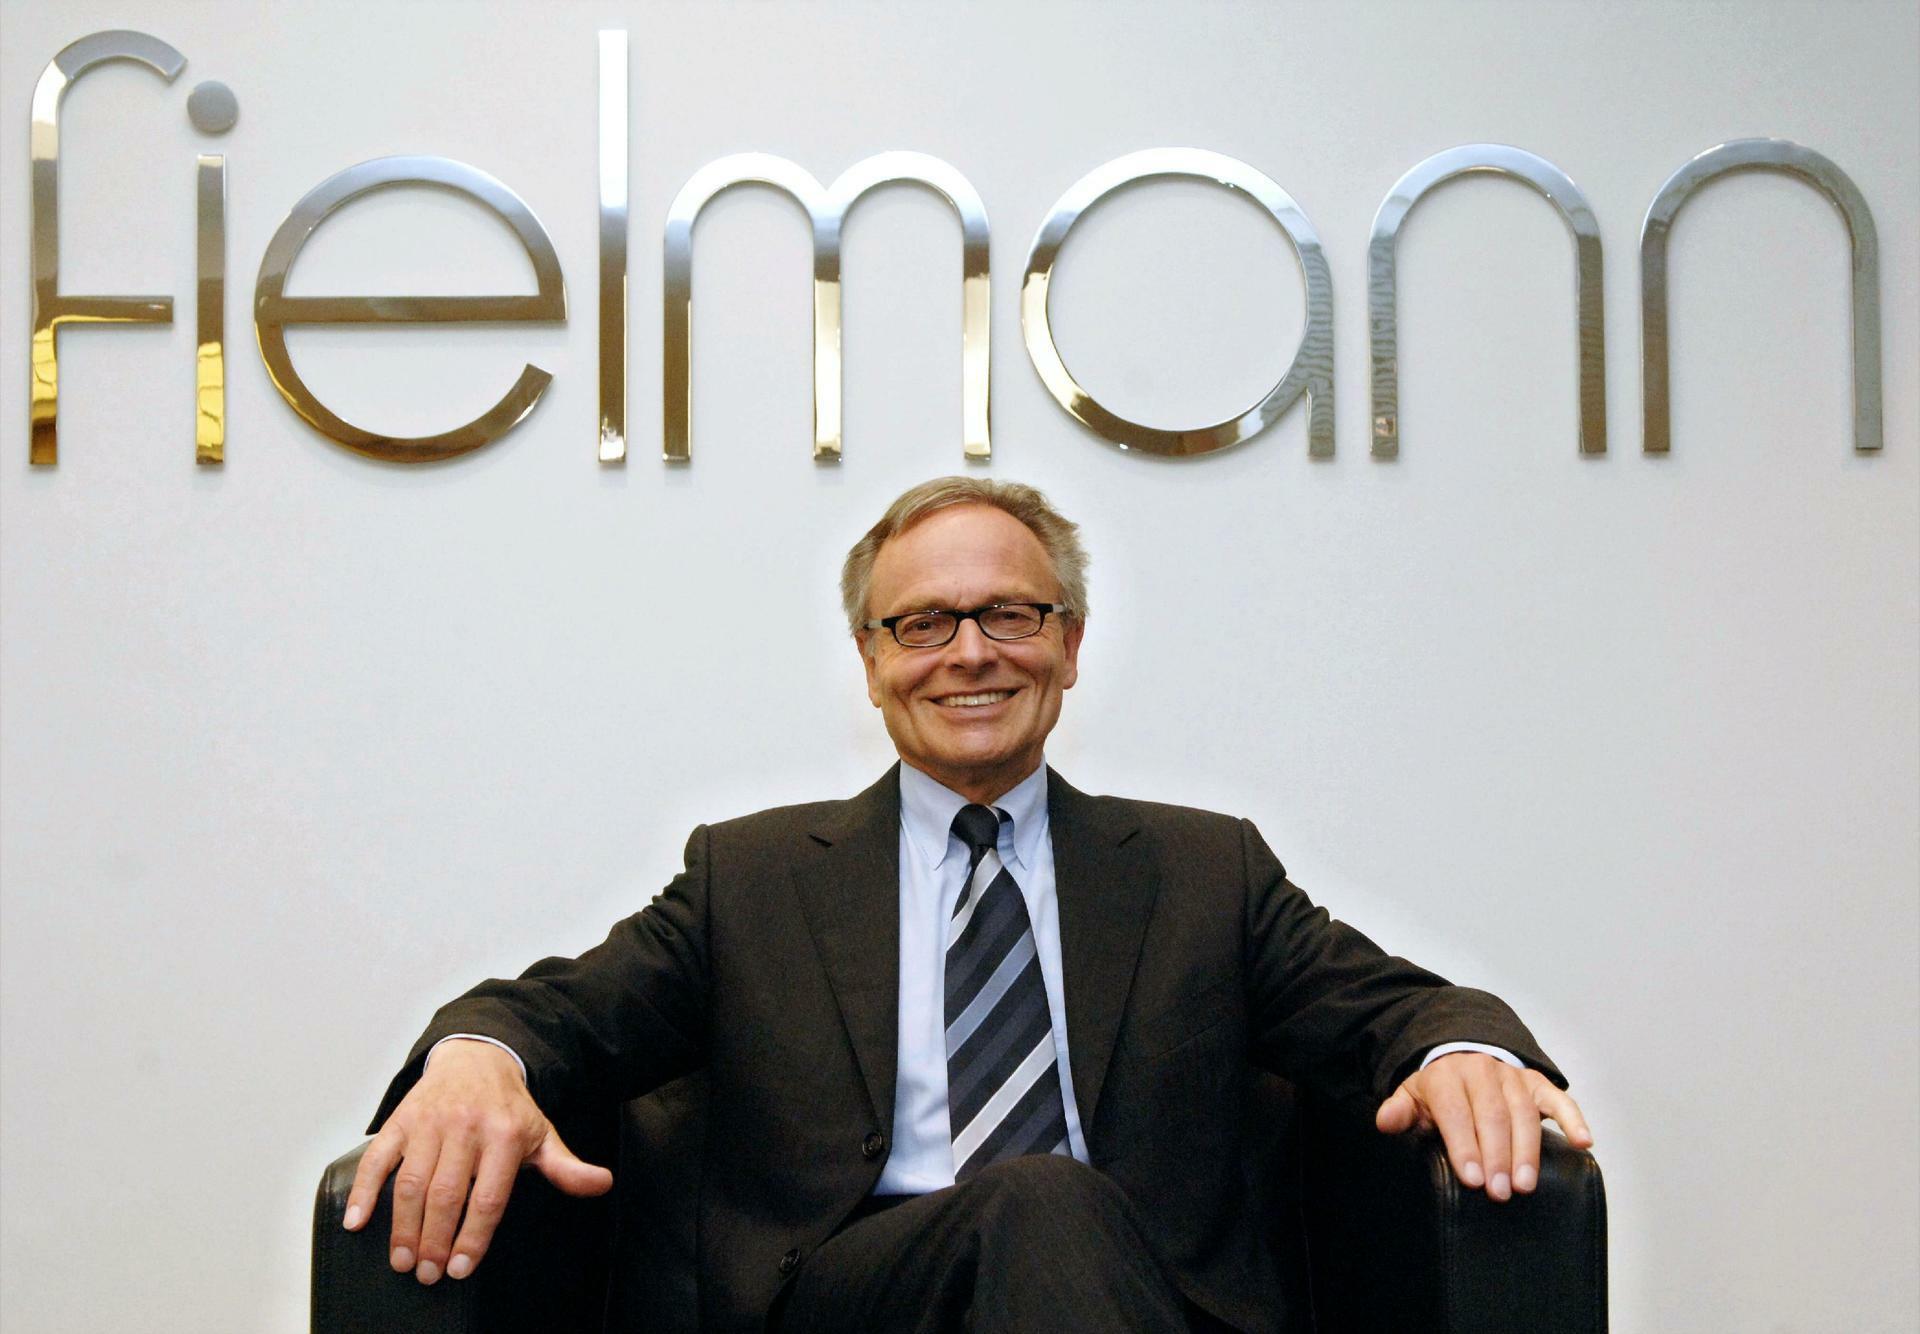 Fielmann scientology